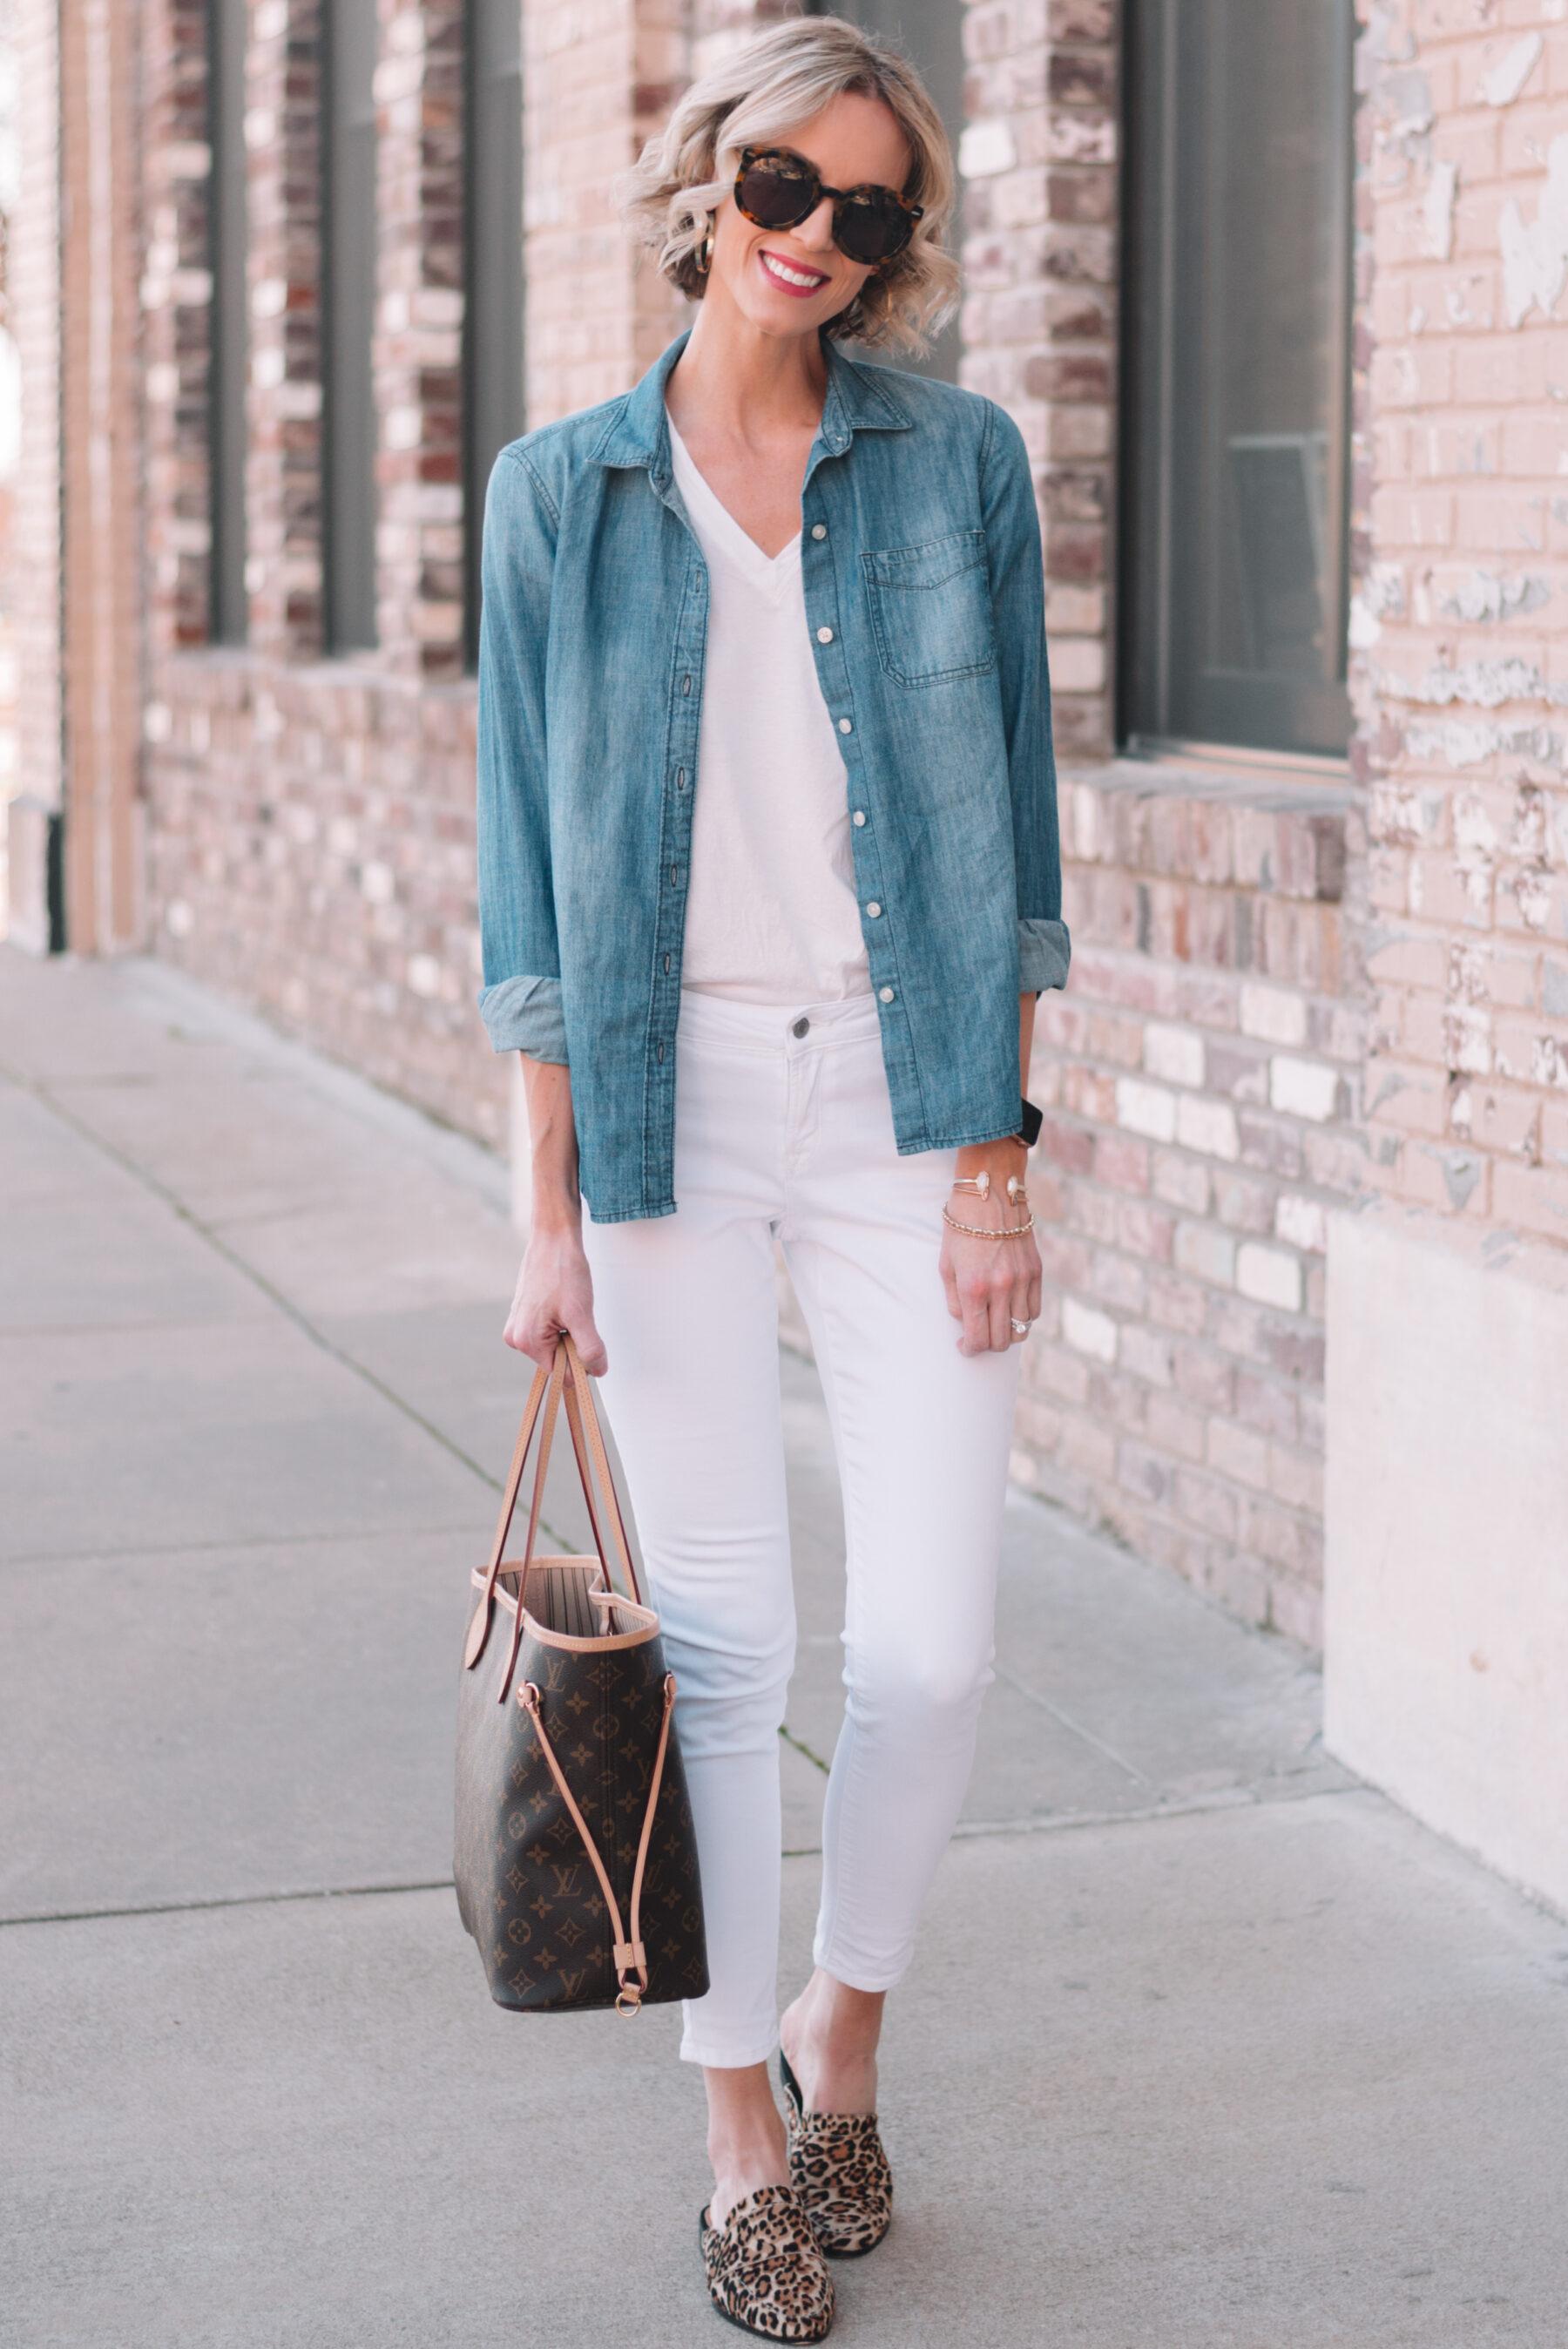 Mini Casual Capsule Wardrobe - 4 Ways to Wear a Chambray